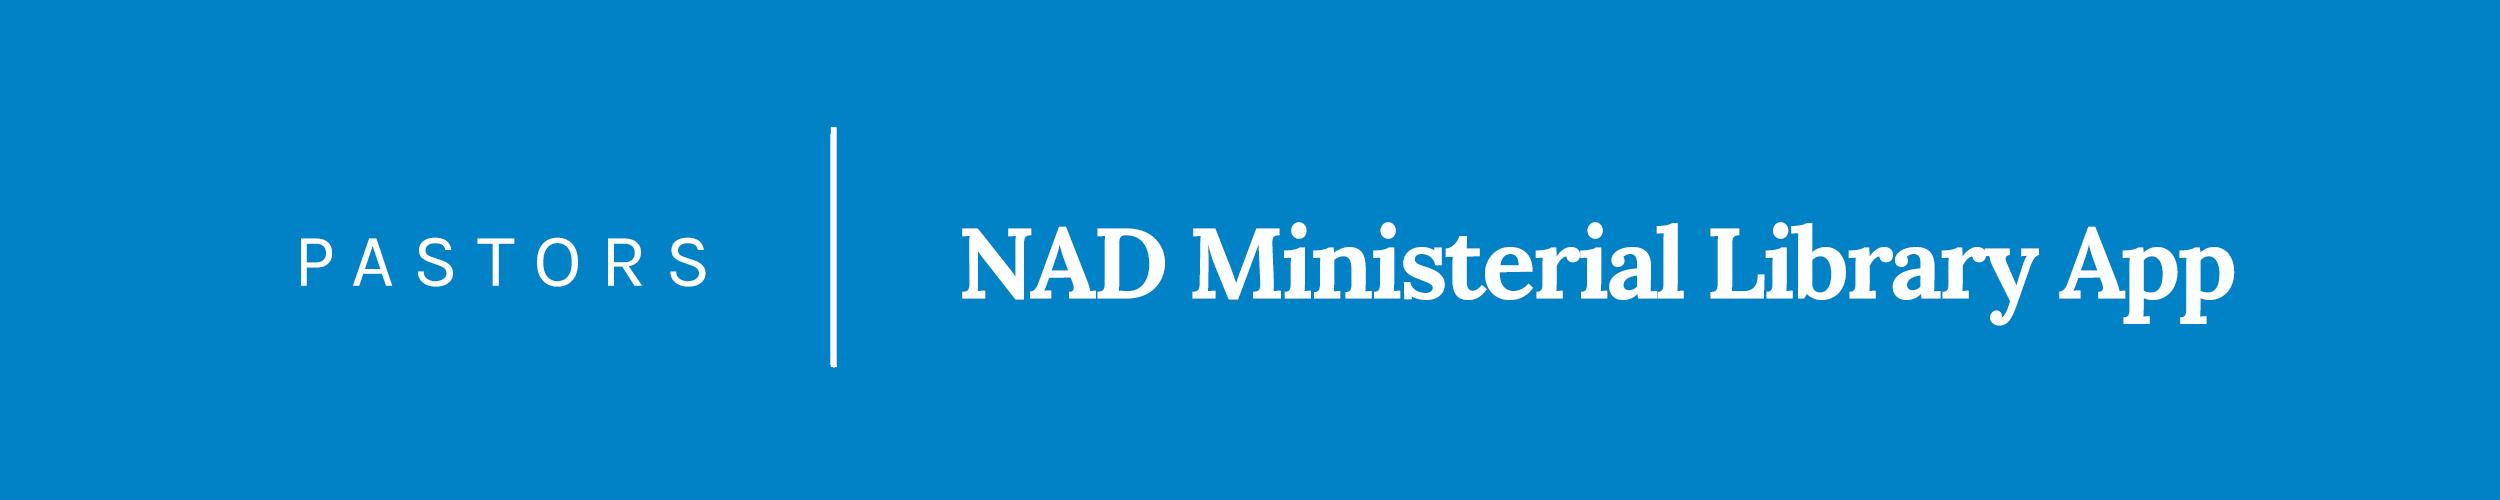 Banner-Pastors-NAD Ministerial Library App.jpg